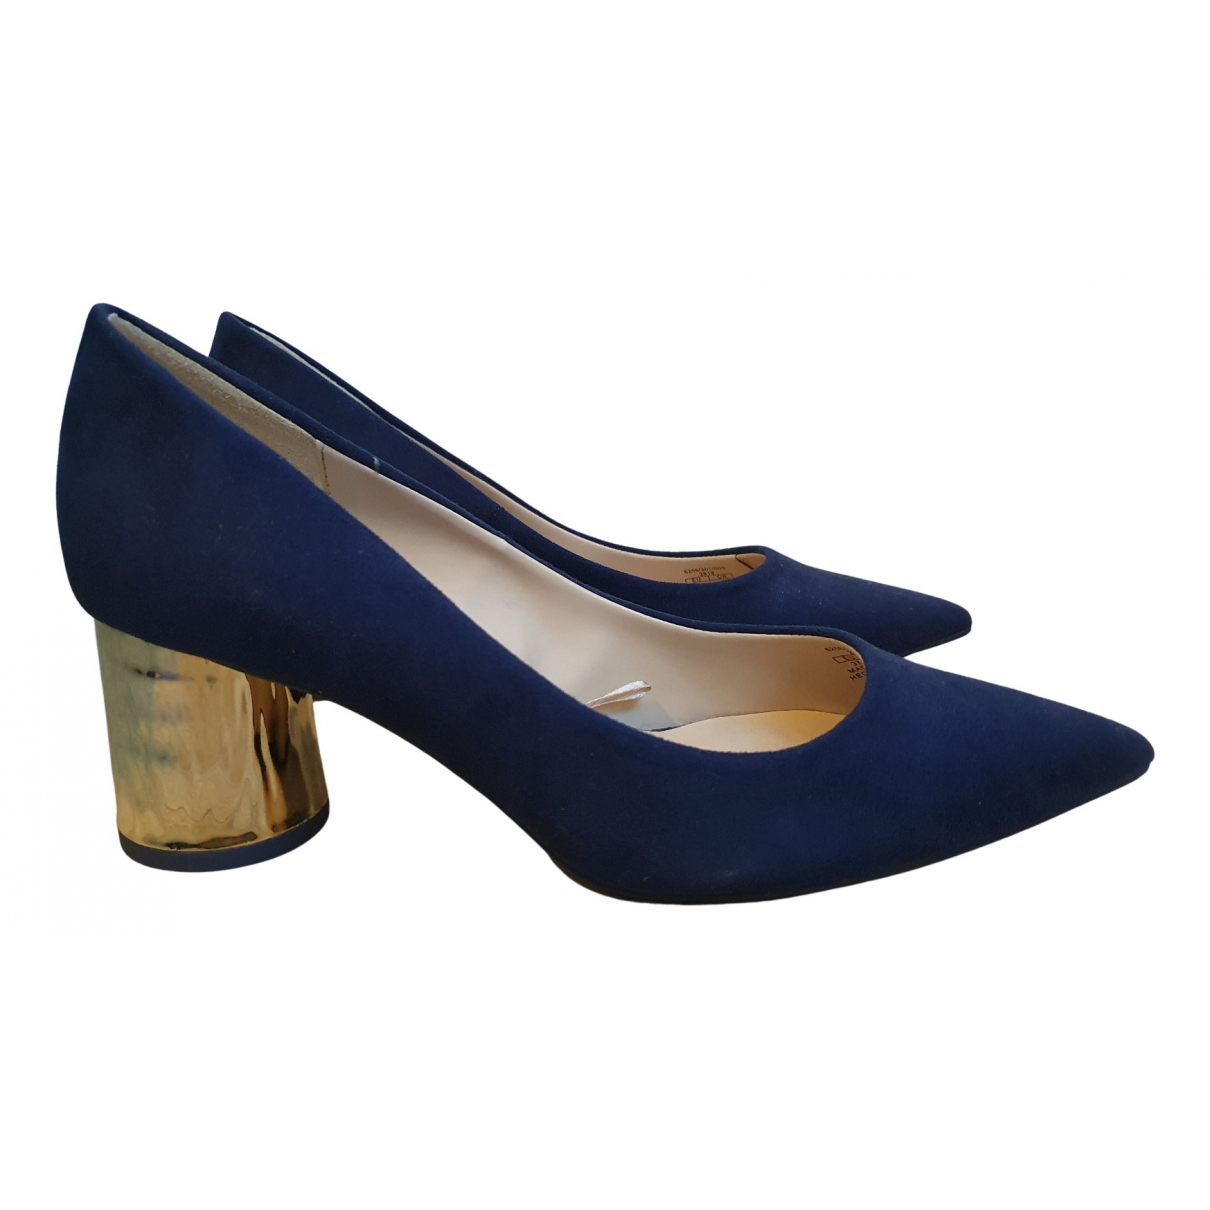 Zara \N Pumps in  Blau Polyester